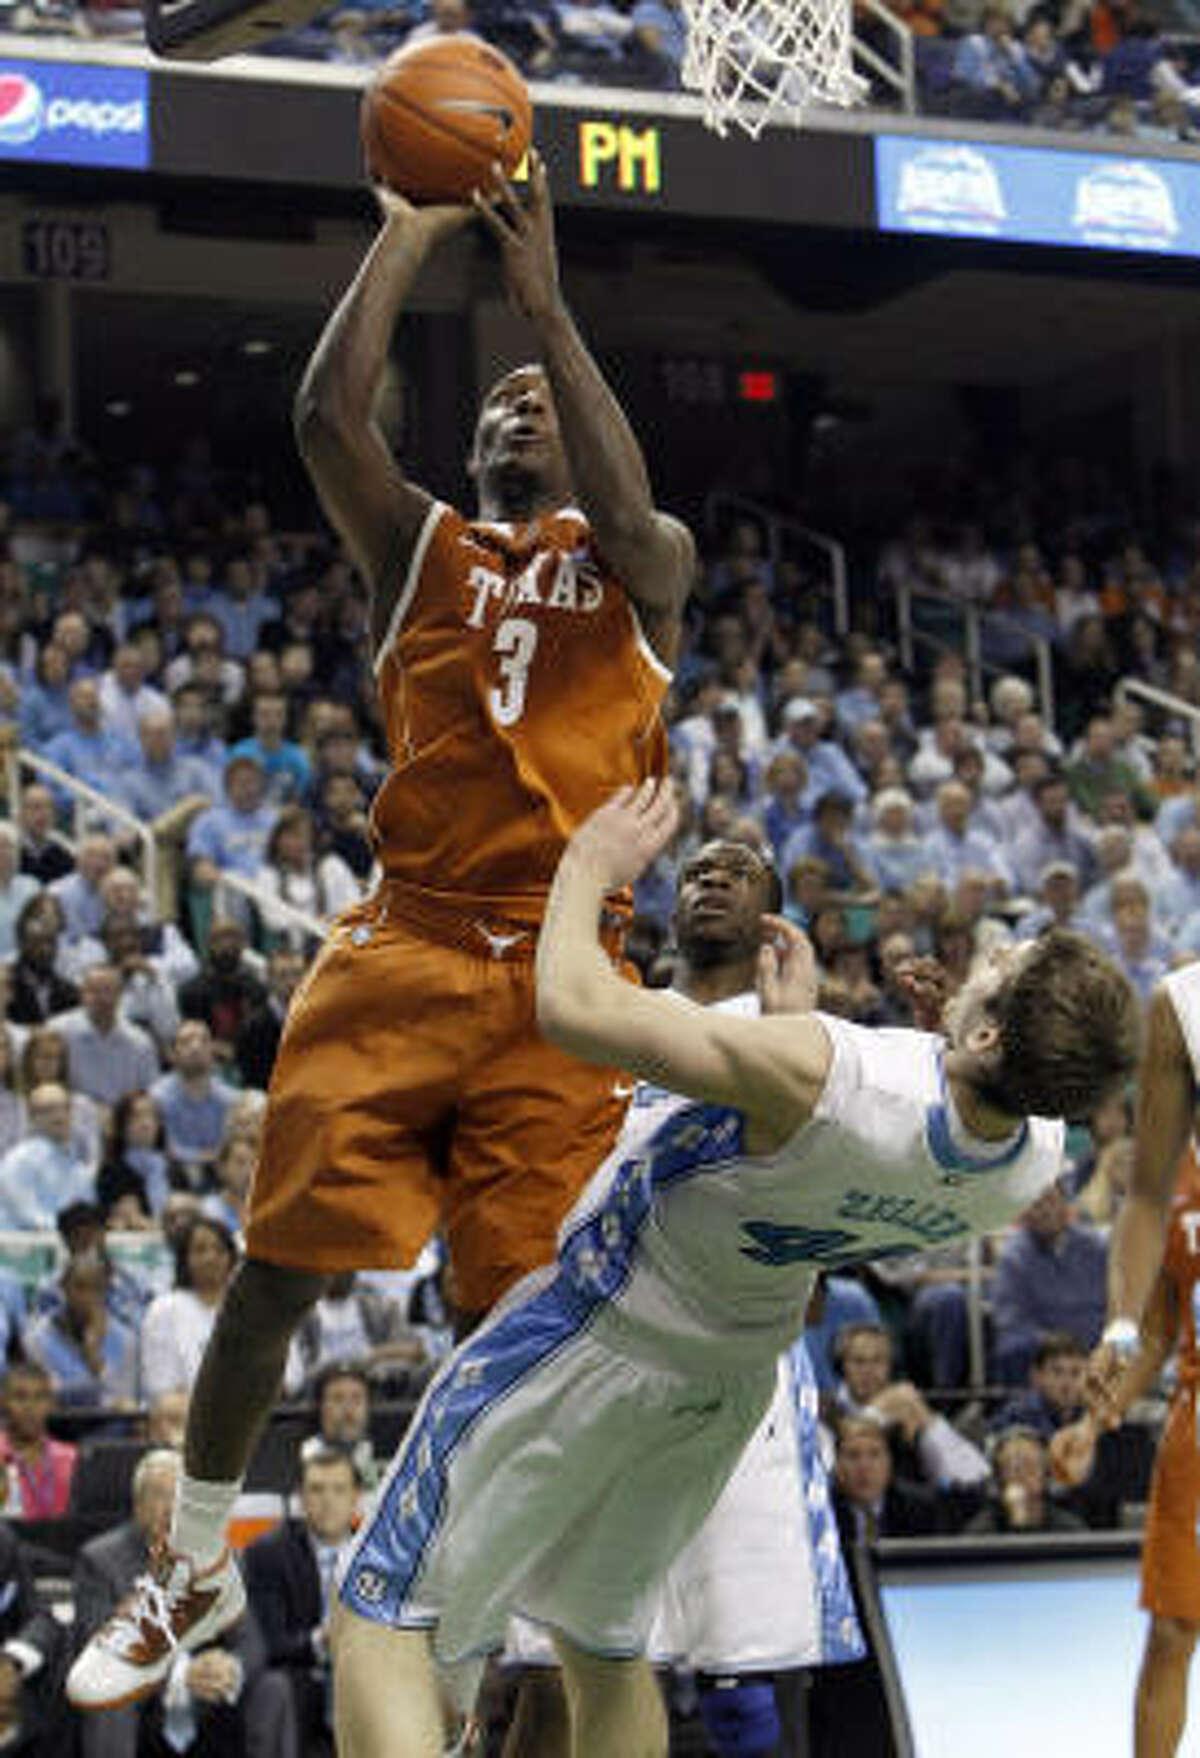 Texas' Jordan Hamilton shoots over North Carolina's Tyler Zeller during the first half.